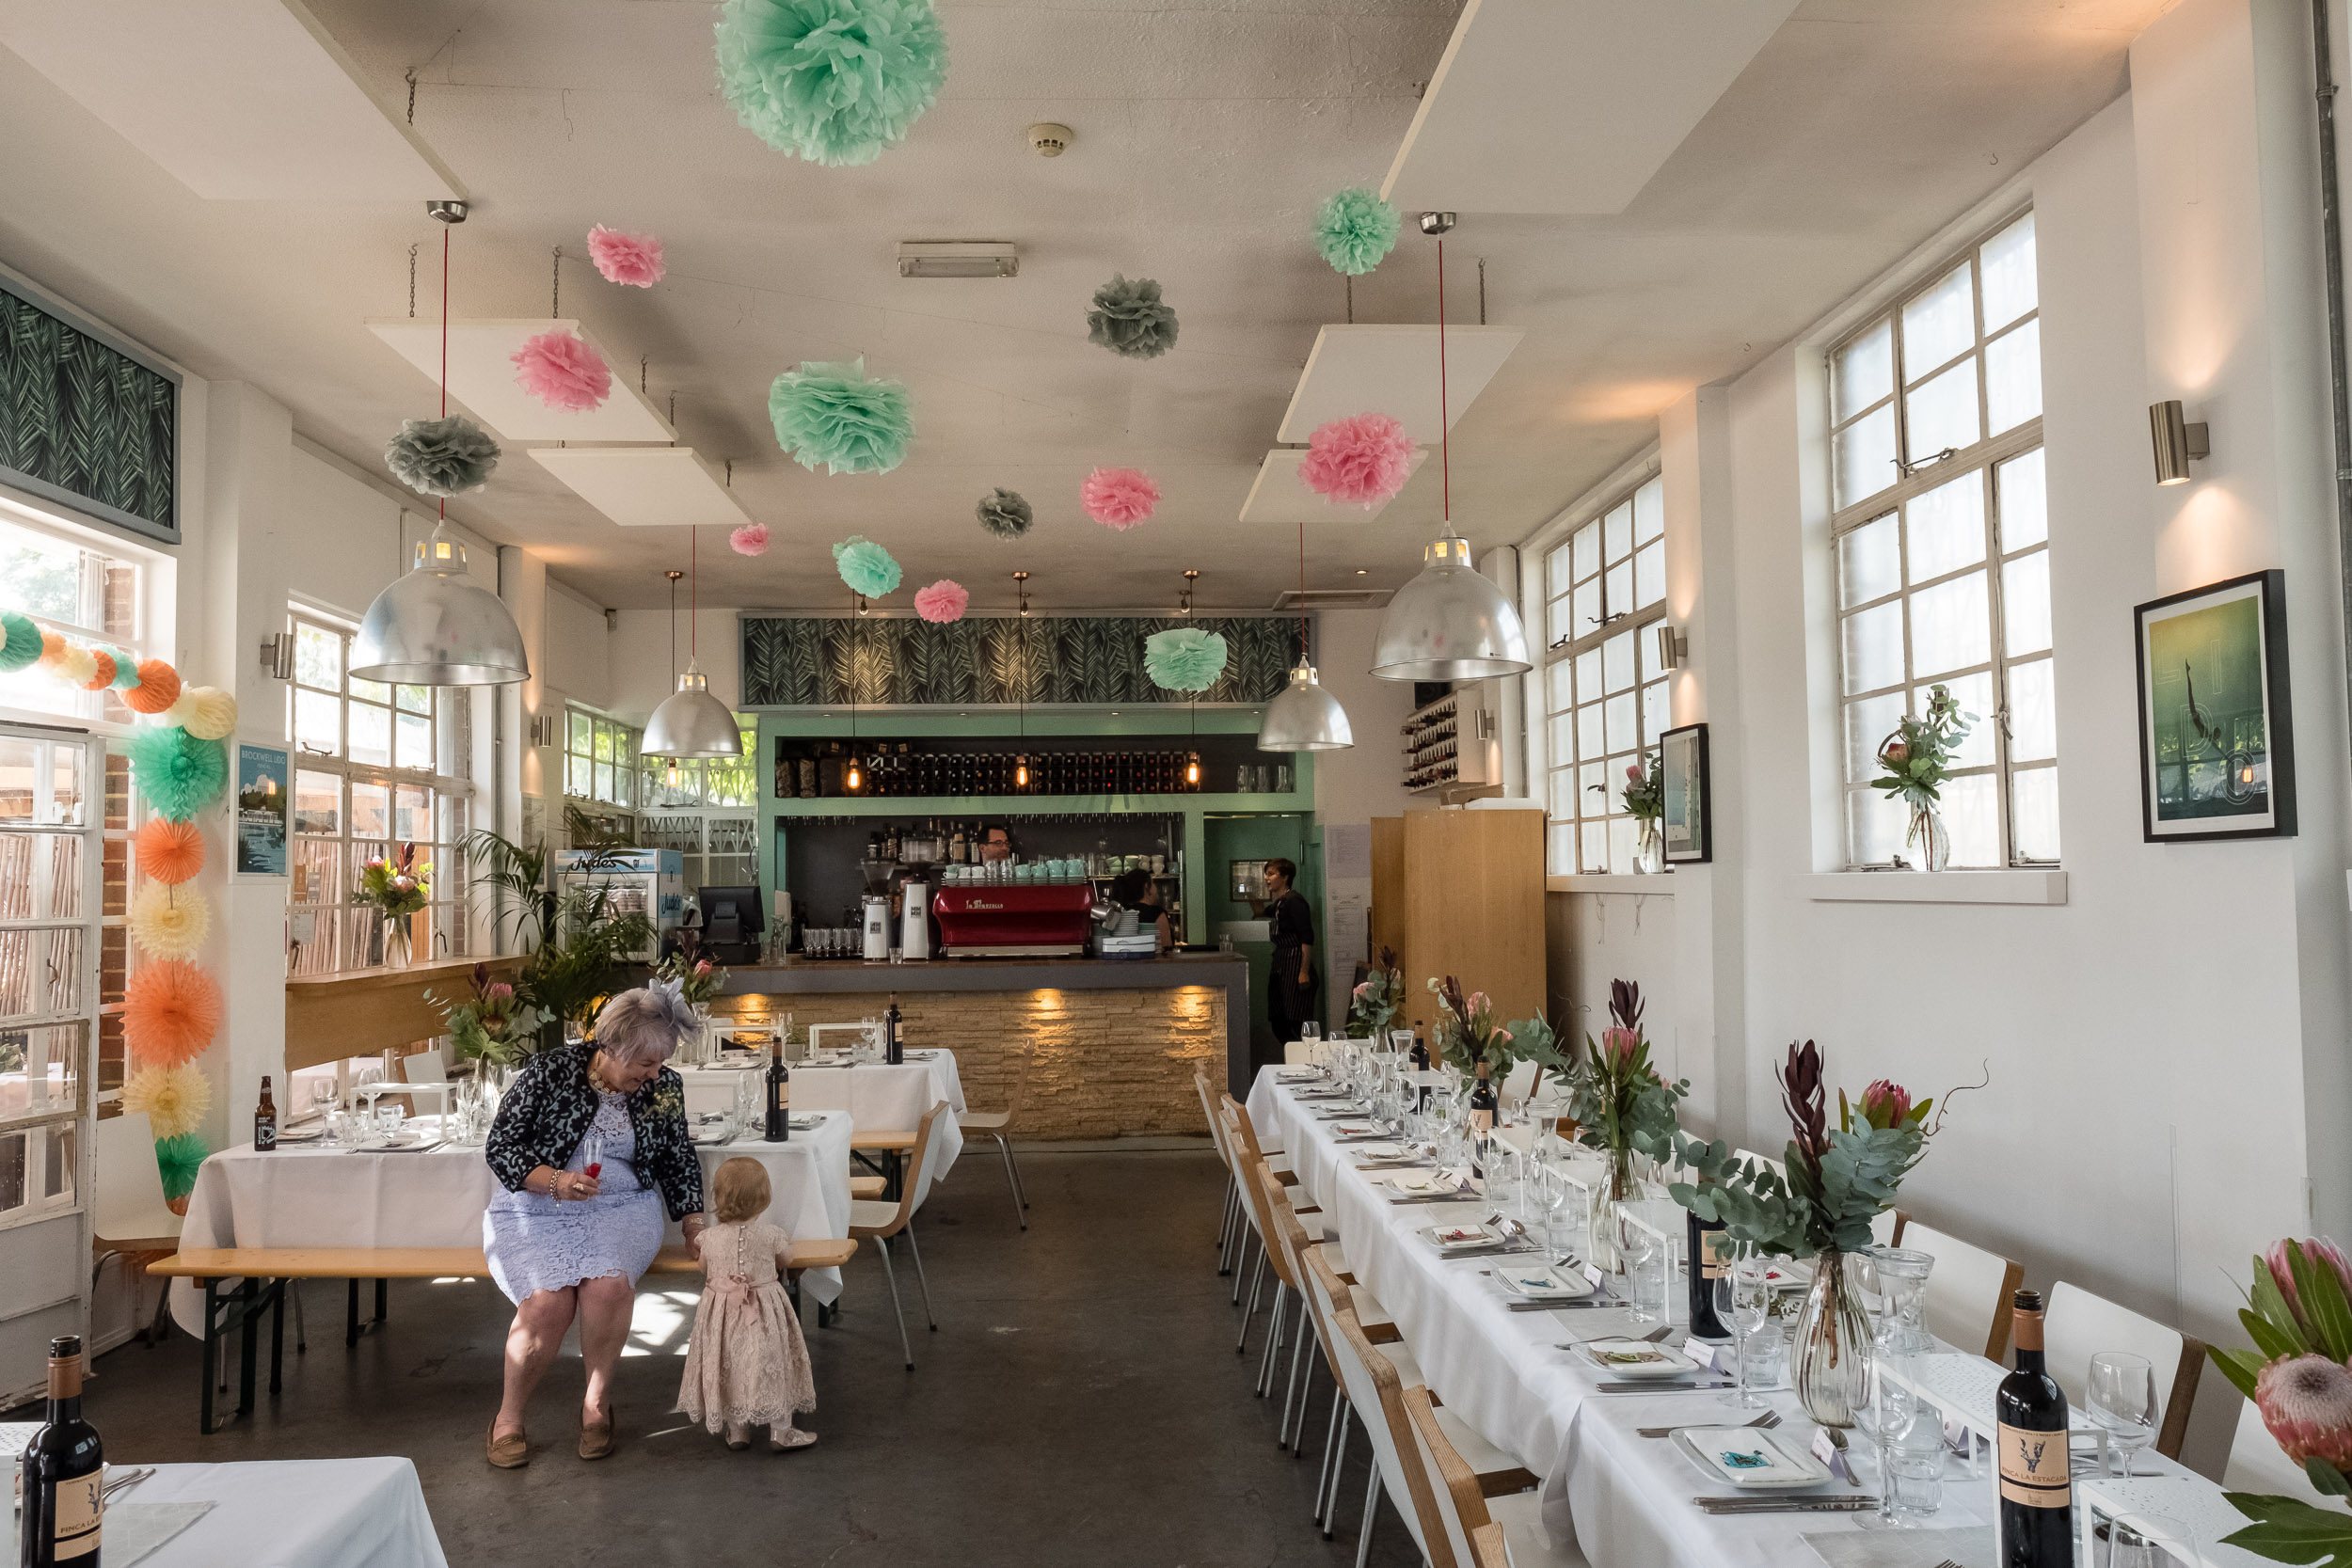 brockwell-lido-brixton-herne-hill-wedding-299.jpg